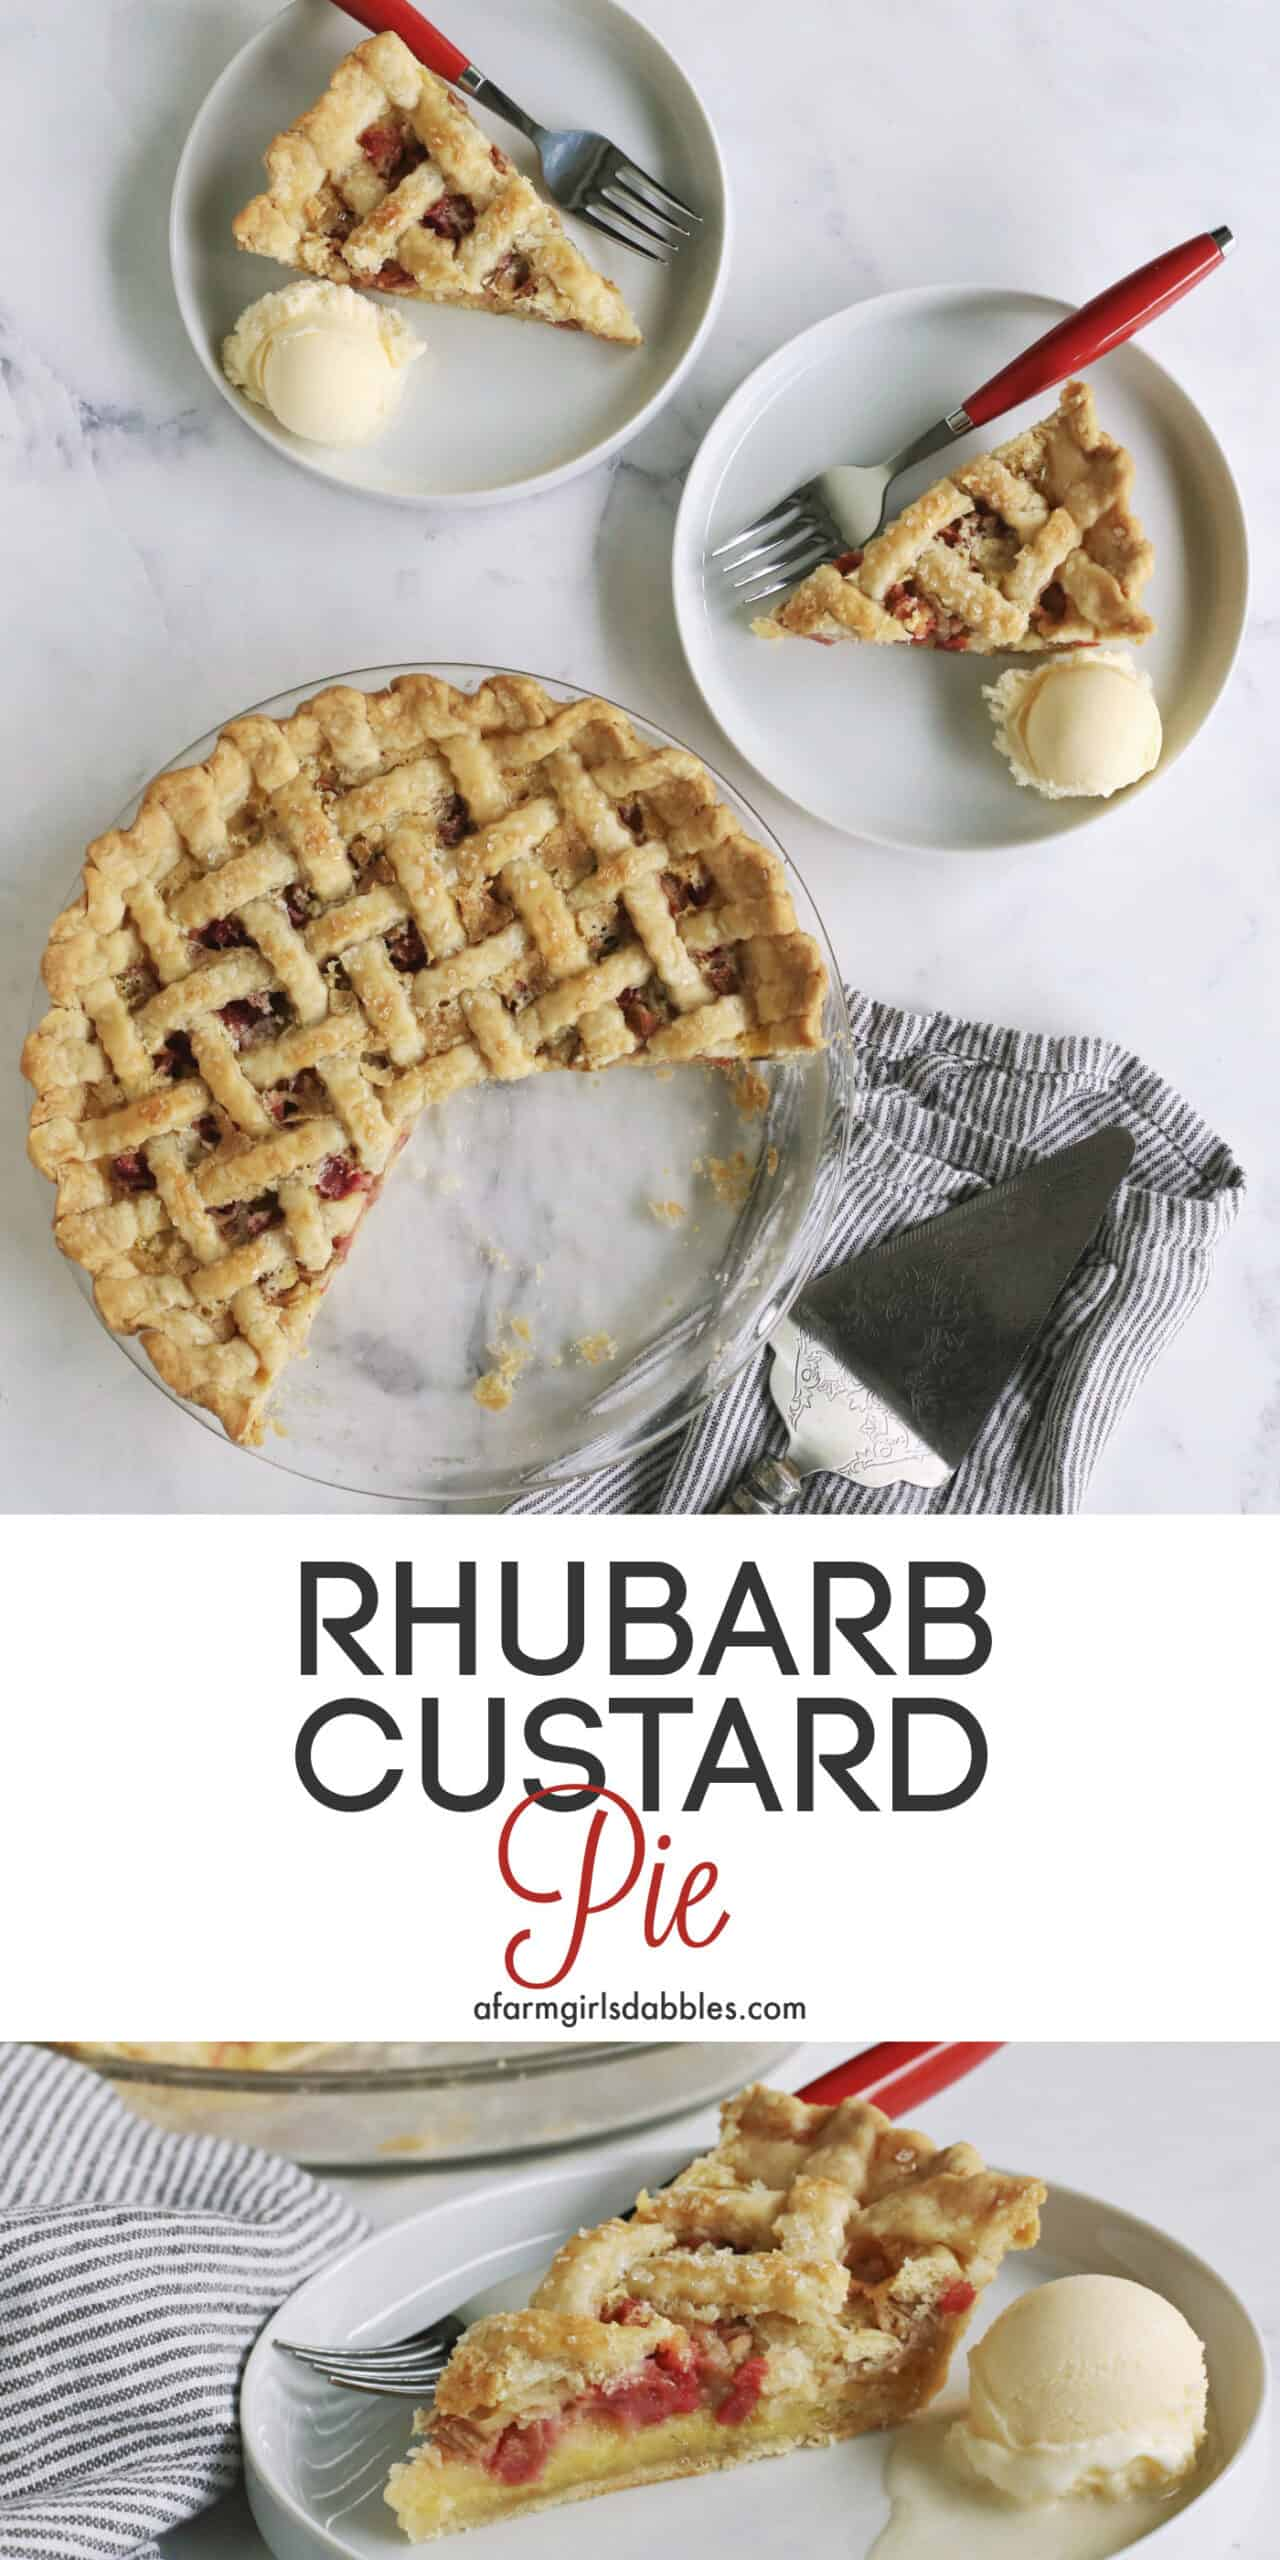 Pinterest image of Rhubarb Custard Pie